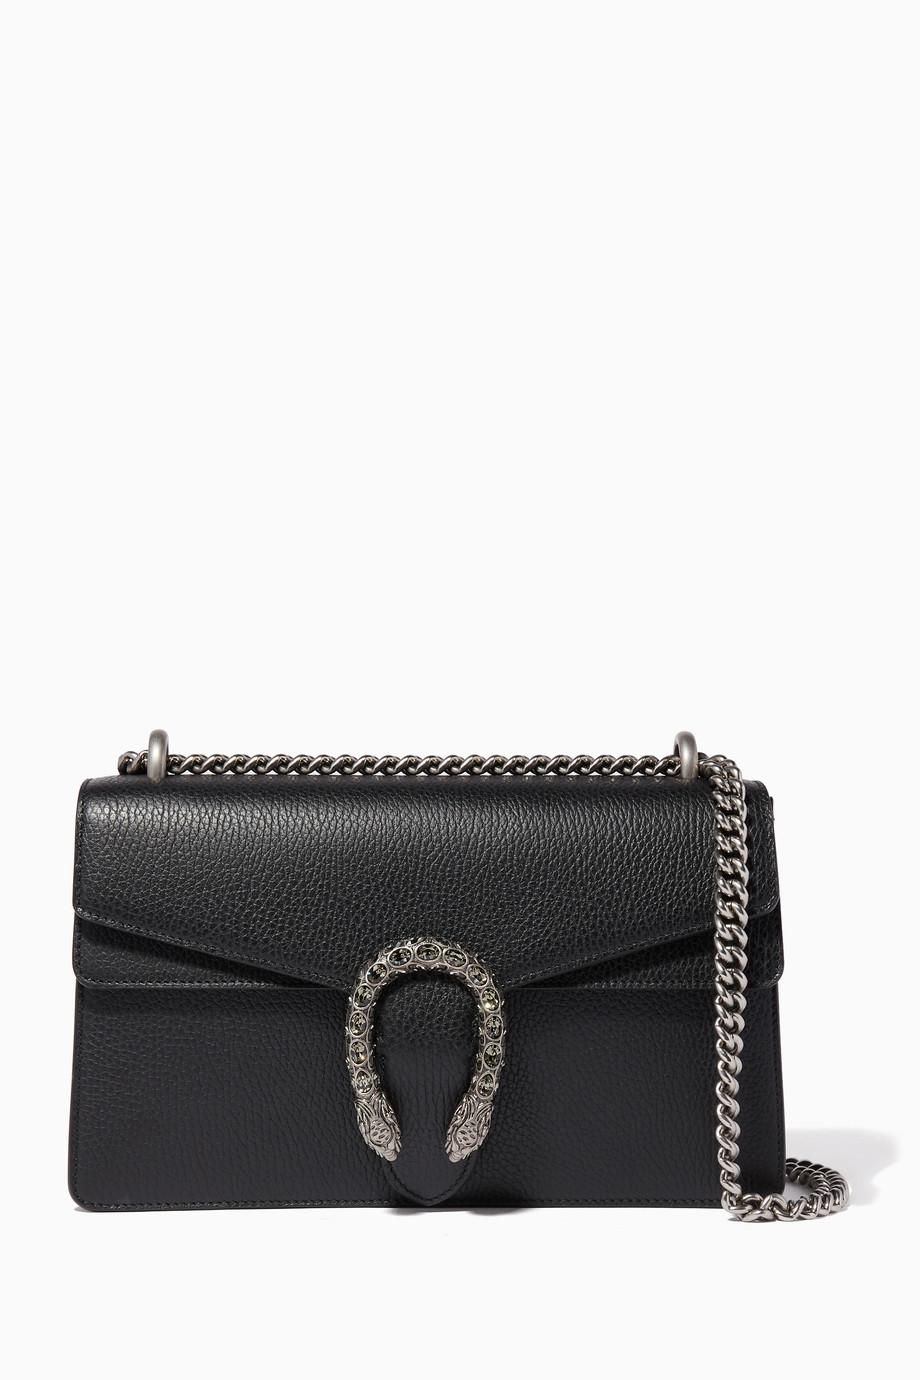 9f099fb07 Shop Gucci Black Black Small Dionysus Leather Shoulder Bag for Women ...